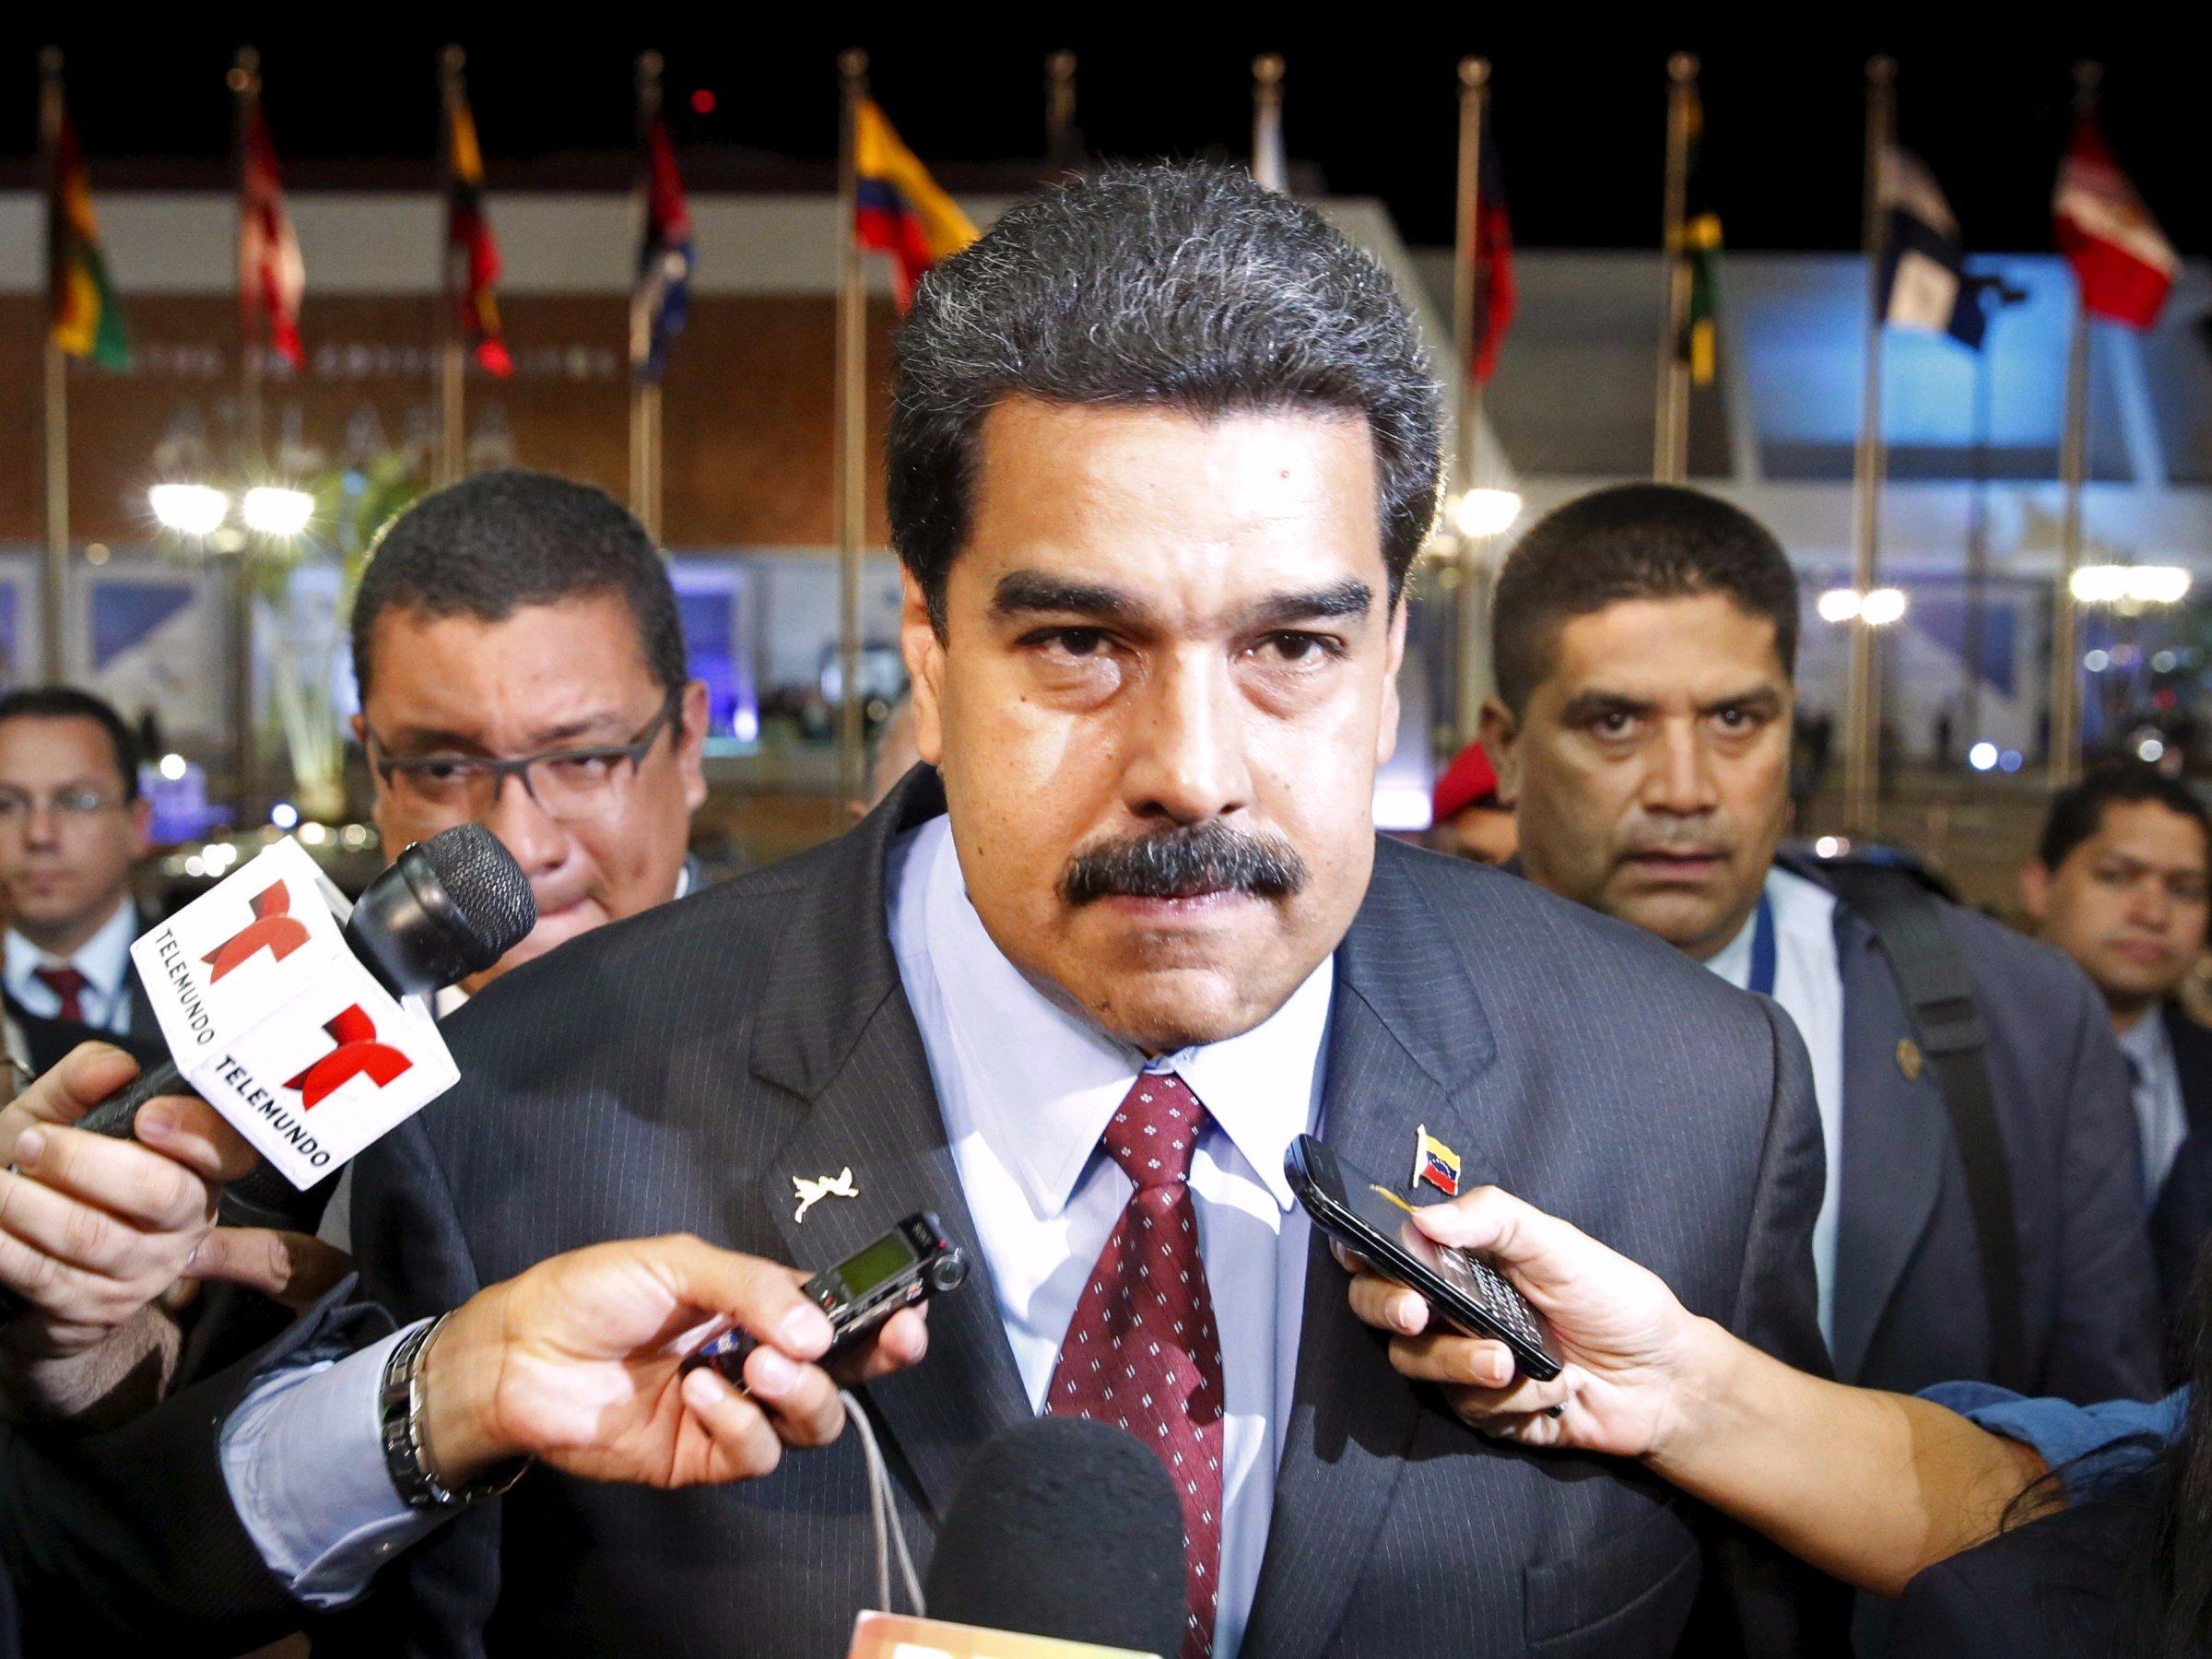 Predsjednik Venezuele Nicolas Maduro.Reuters